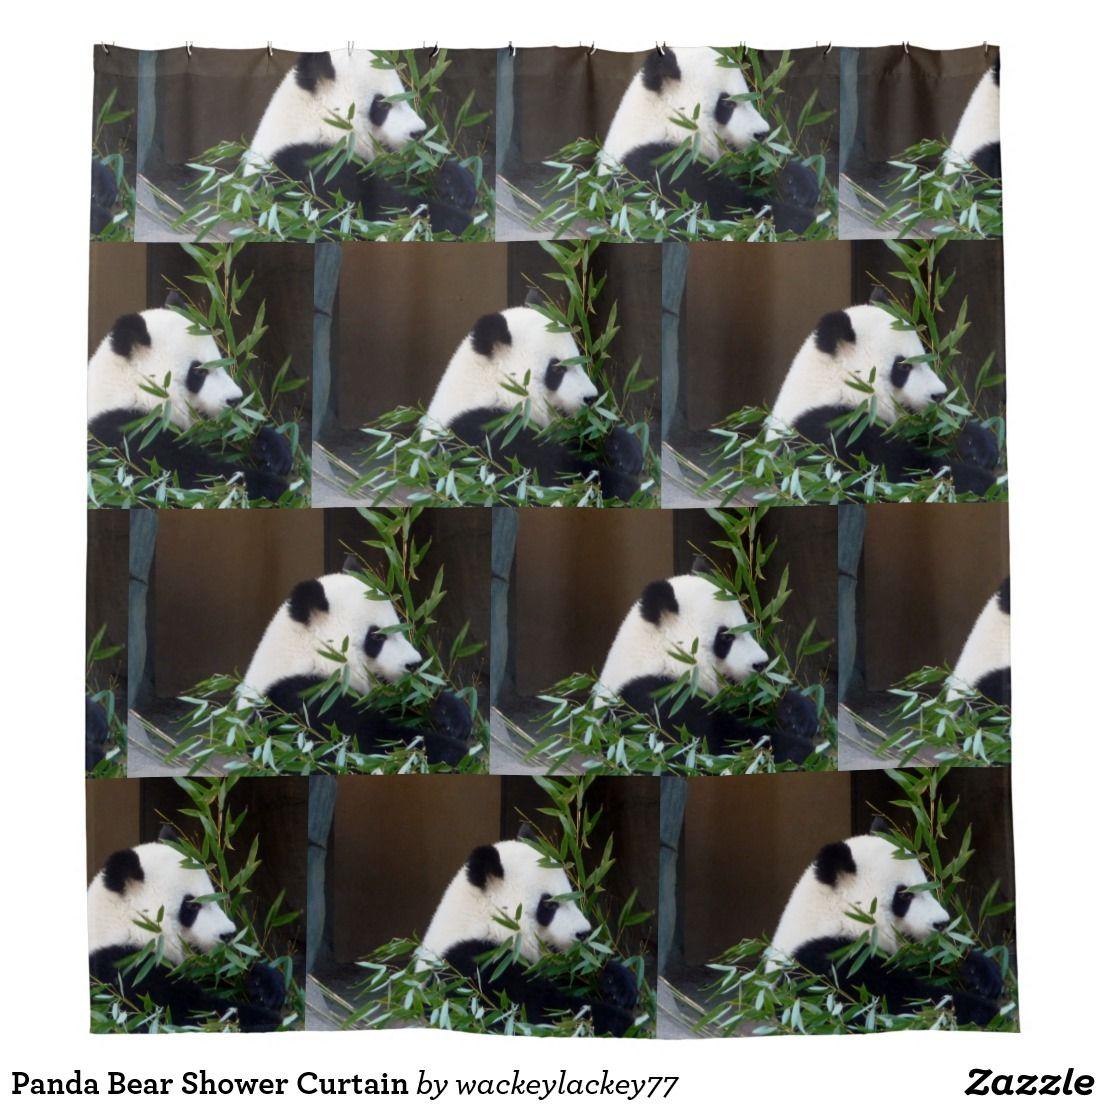 Panda Bear Shower Curtain Zazzle Com Panda Bear Shower